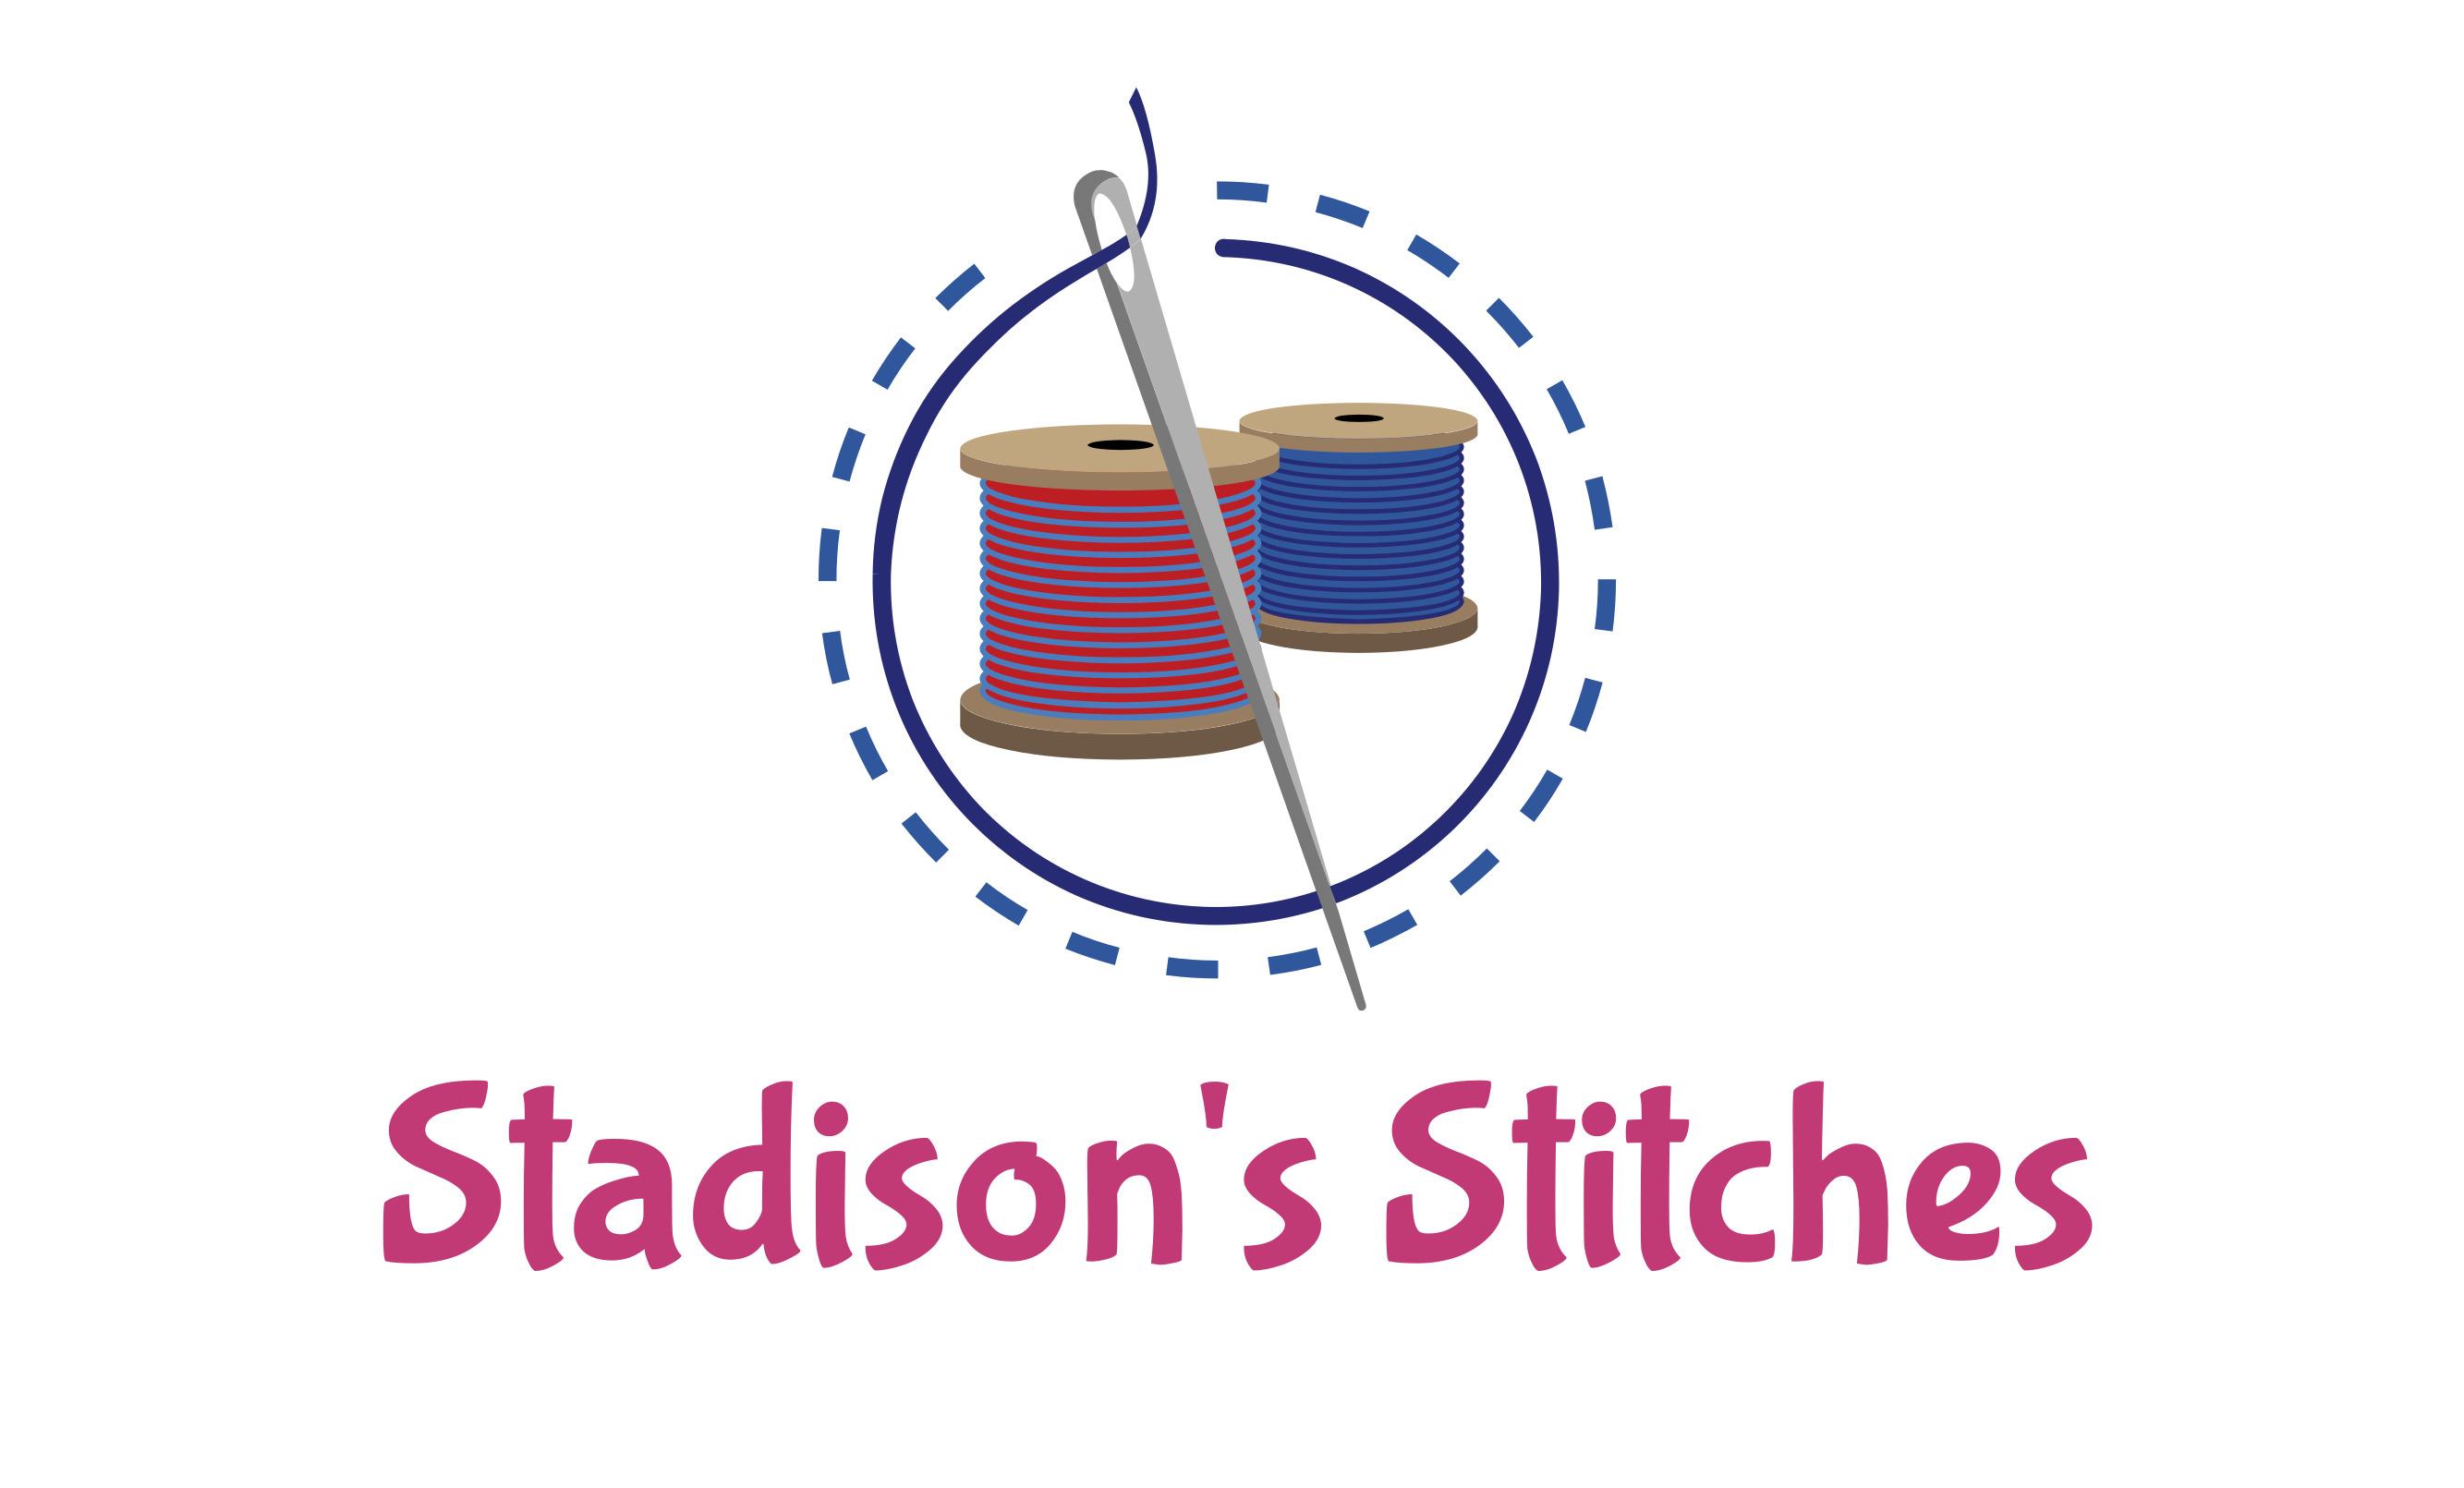 Stadison's Stitches - Macon, GA 31220 - (478)808-4171 | ShowMeLocal.com